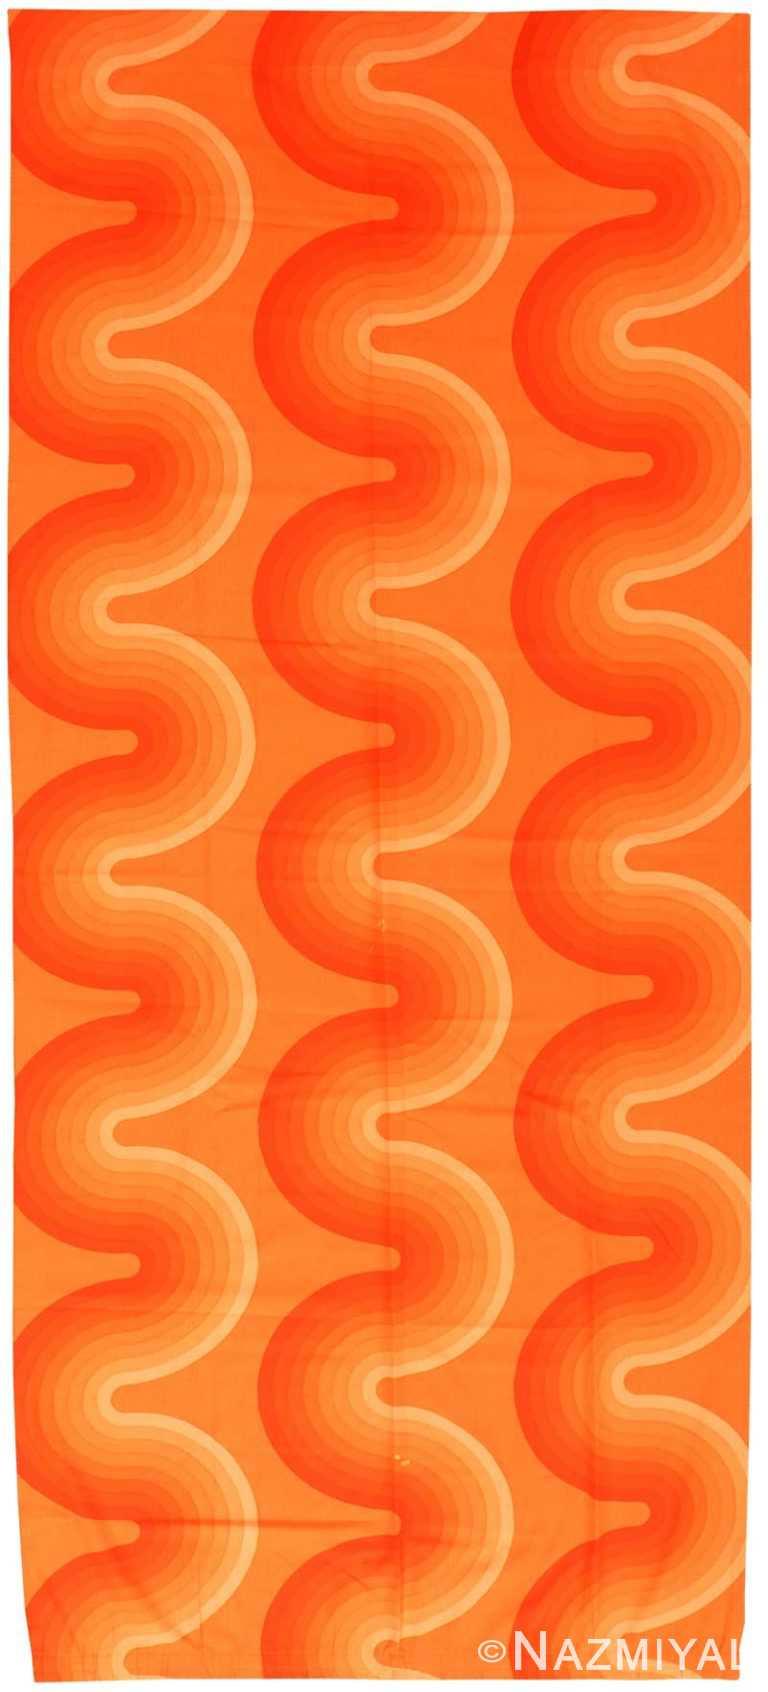 Vintage Scandinavian Verner Panton Kurve Textile 47821 by Nazmiyal NYC